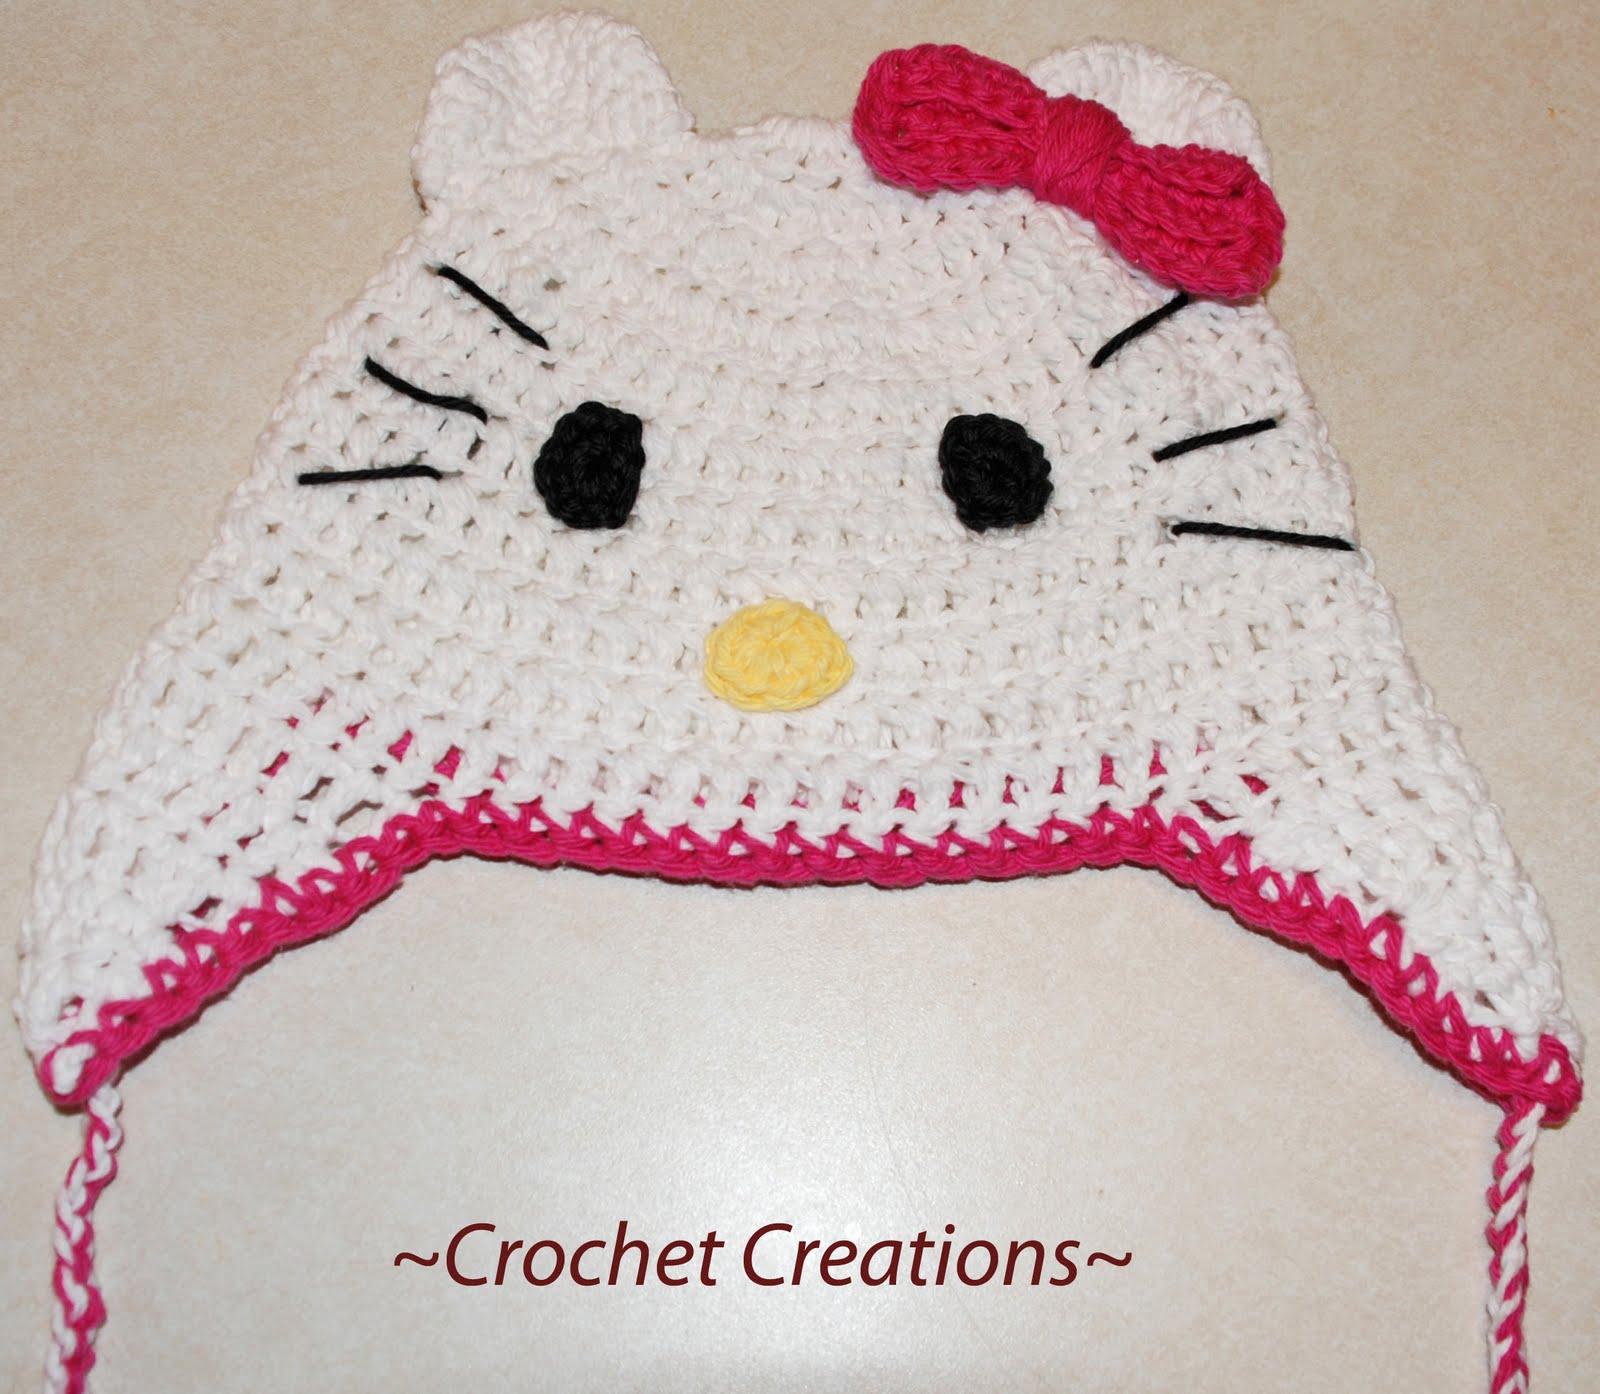 Crochet Patterns For Hello Kitty : Hello Kitty Crochet Headband images